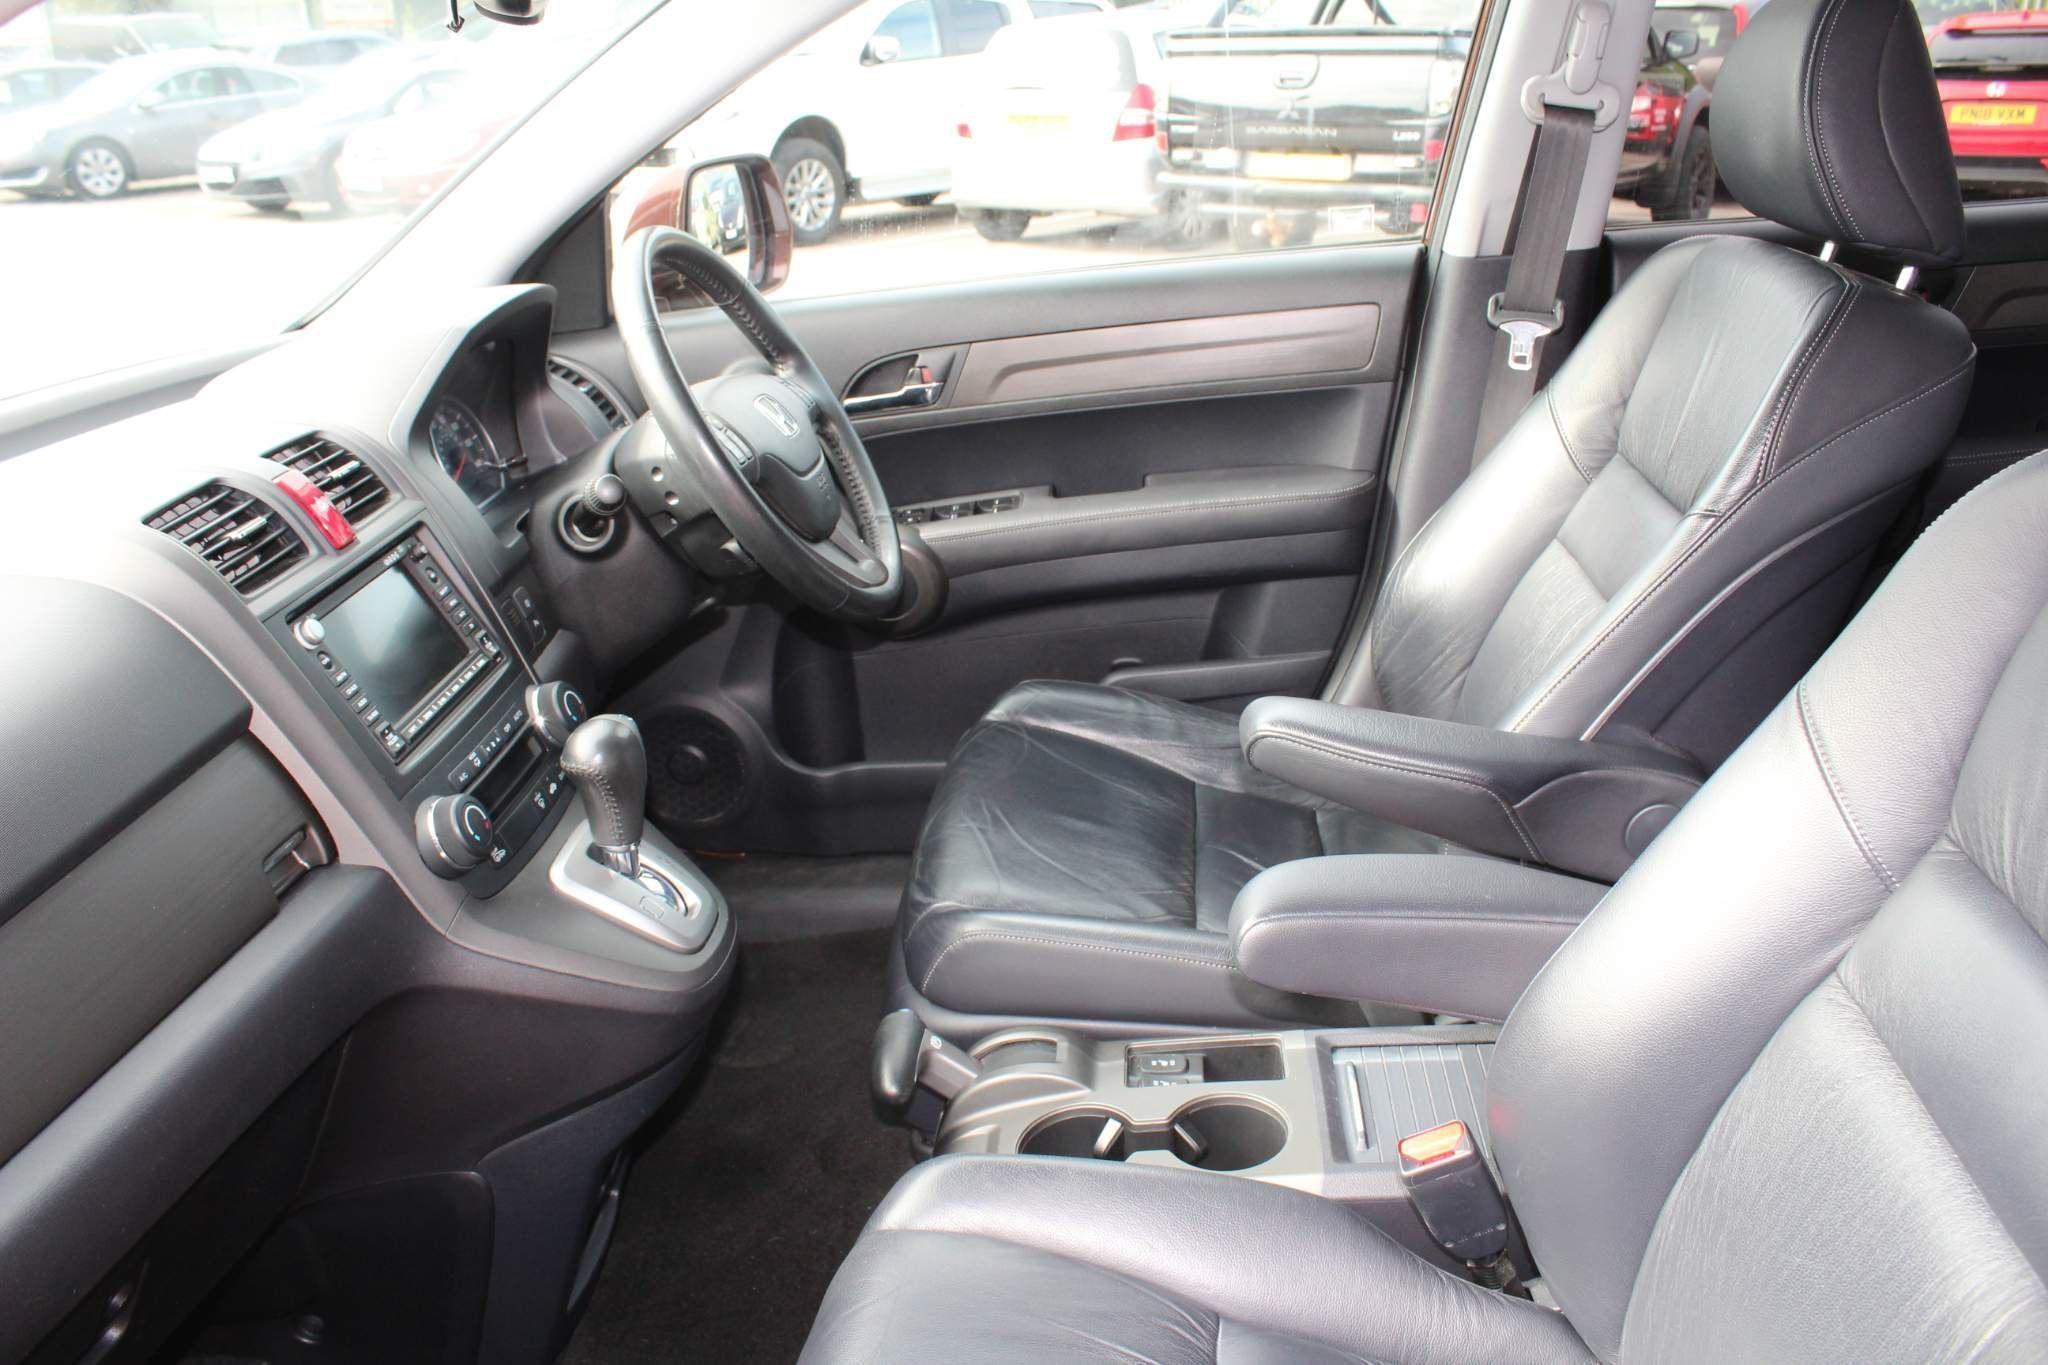 Honda CR-V Images